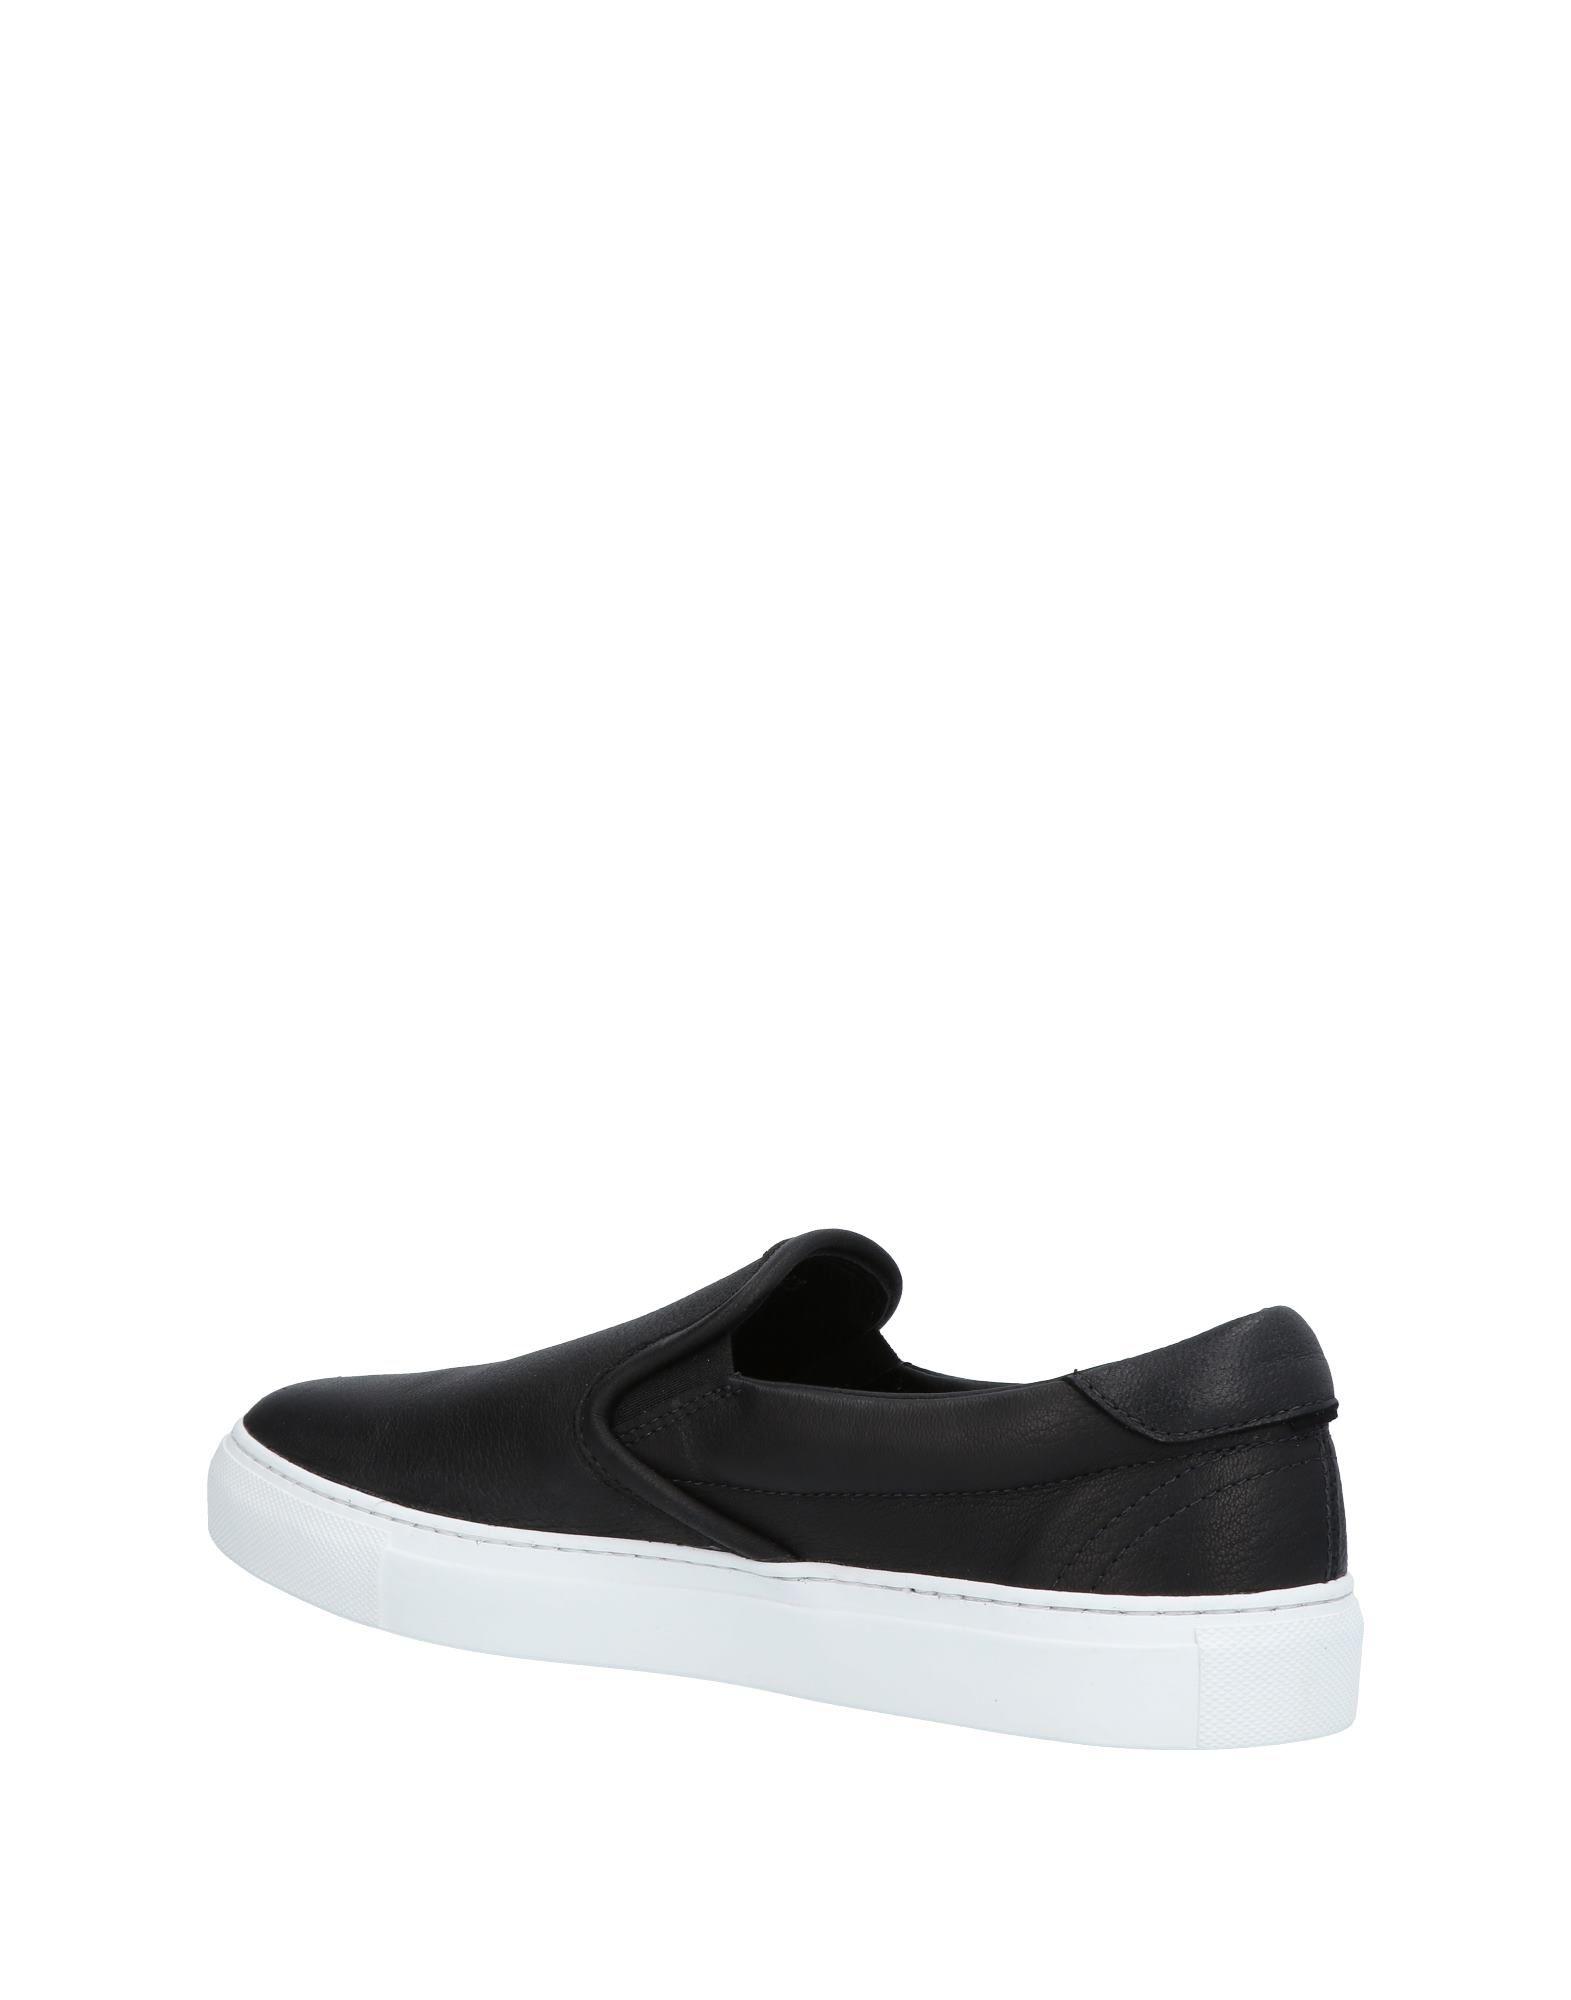 Diemme Sneakers Herren  11418803BU Schuhe Gute Qualität beliebte Schuhe 11418803BU 3e3c67